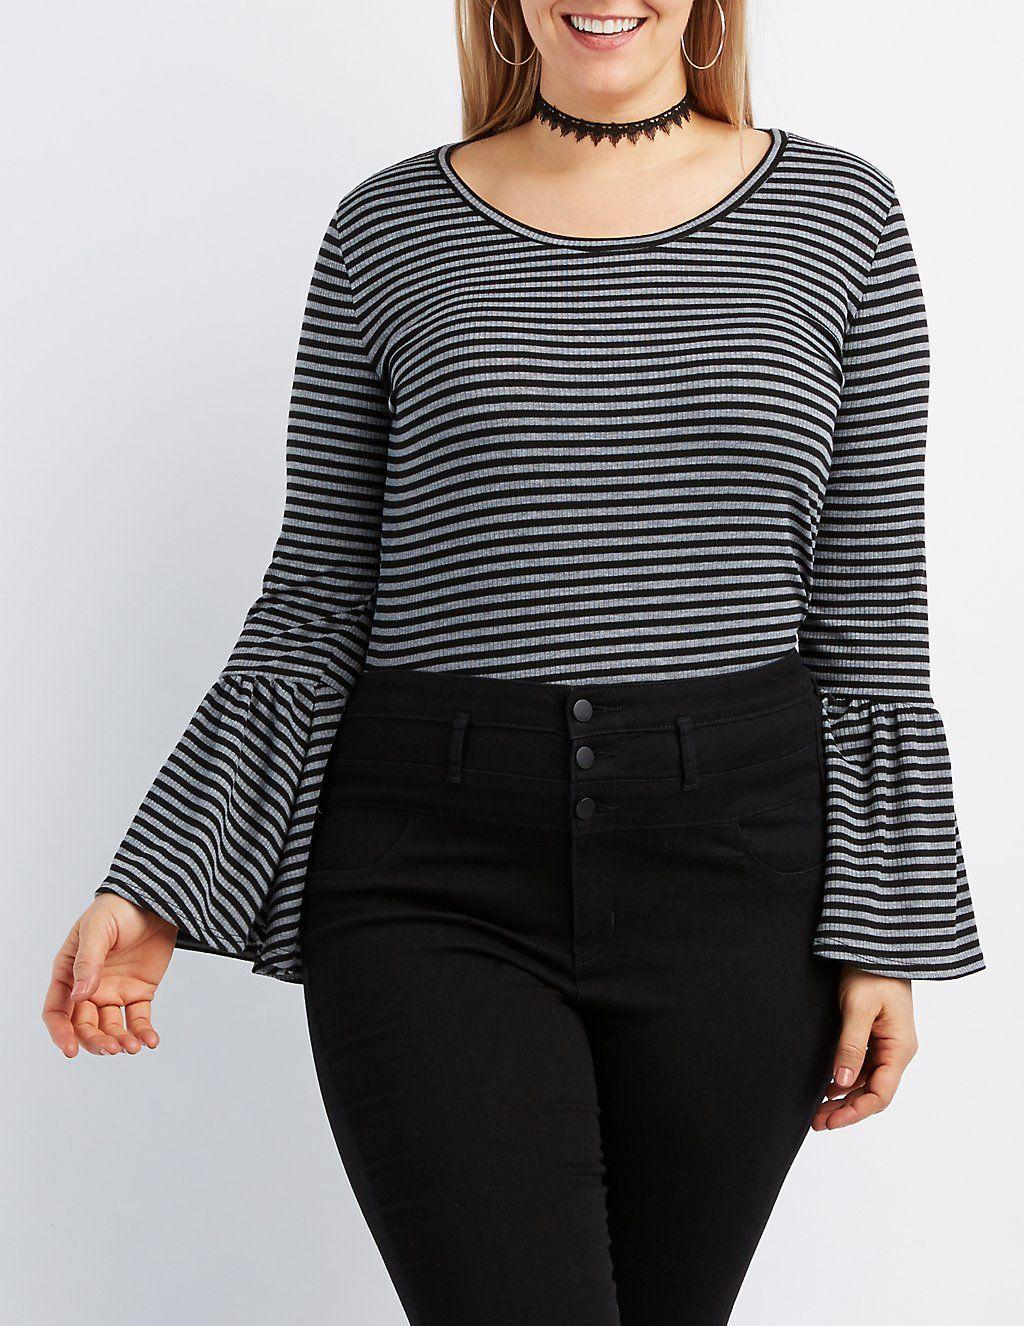 eefc4a48158 Plus Size Striped Bell Sleeve Crop Top